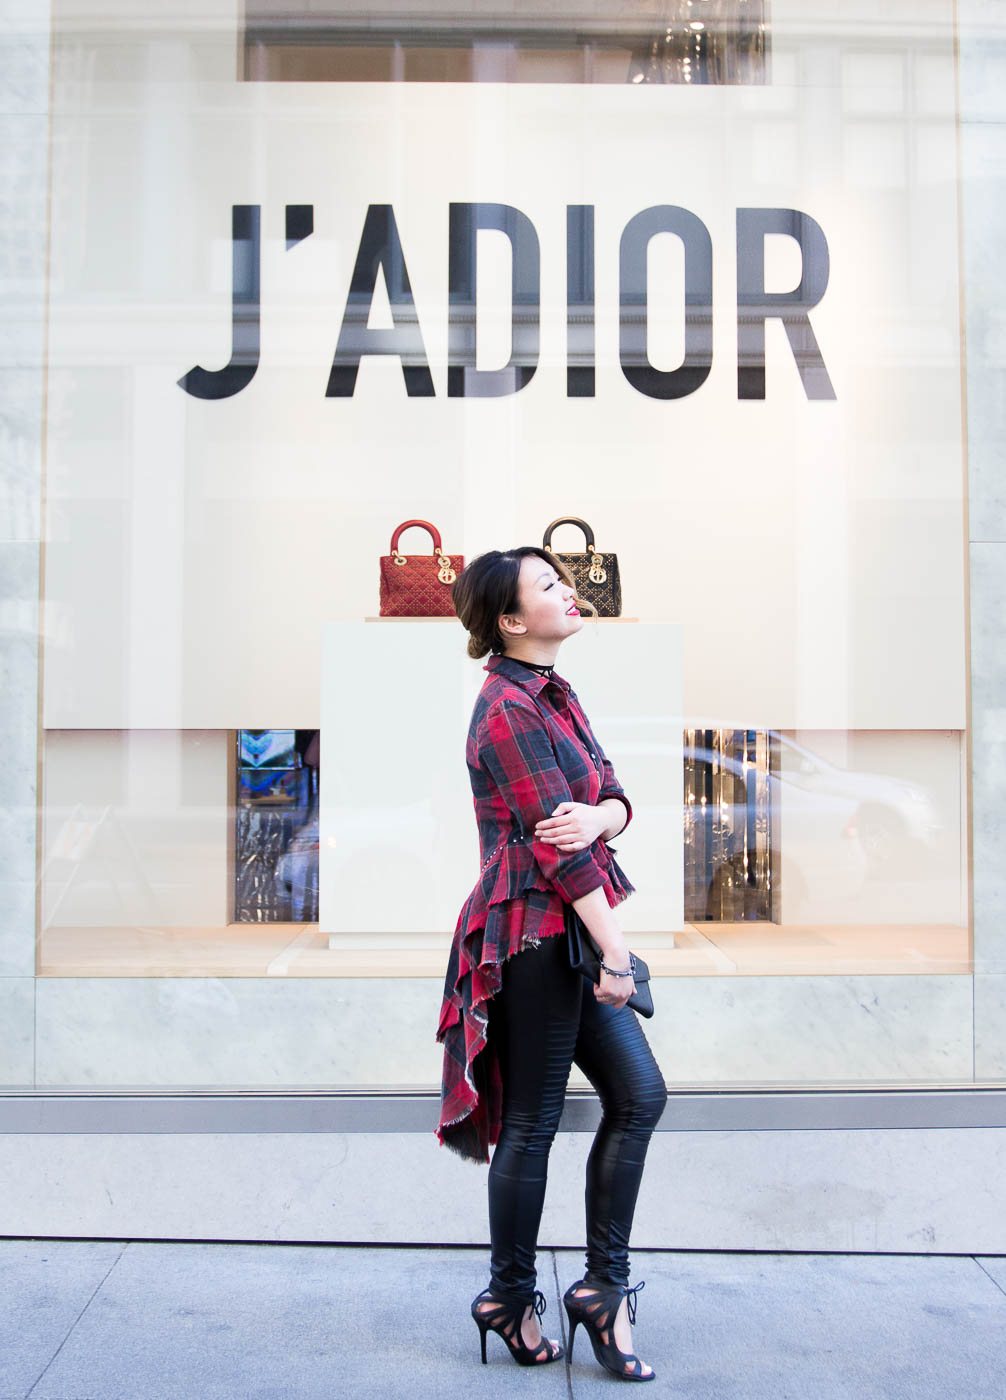 Dior - J'adior | The Chic Diary